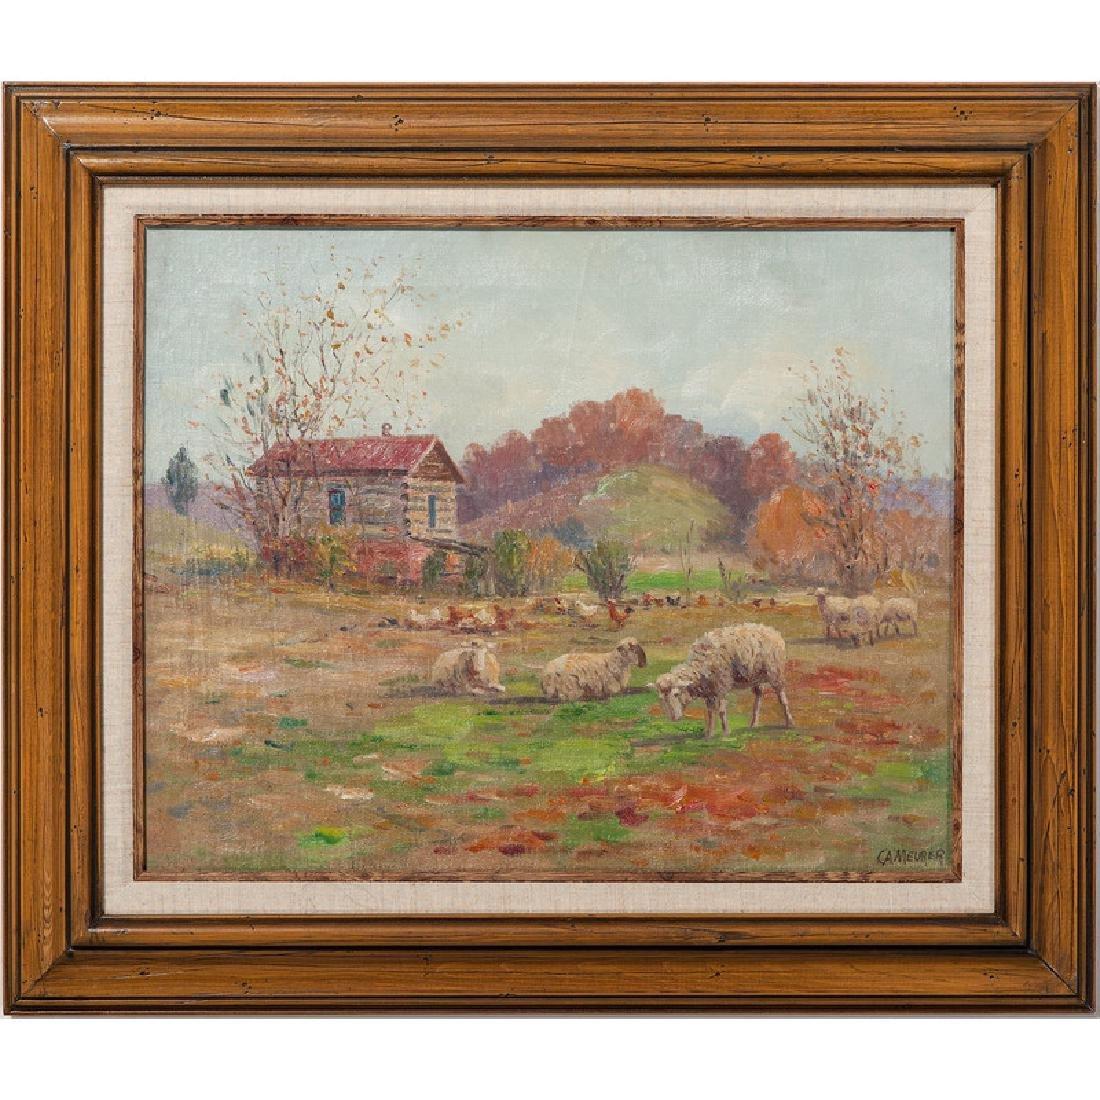 Charles Meurer (Cincinnati, 1865-1955), Oil